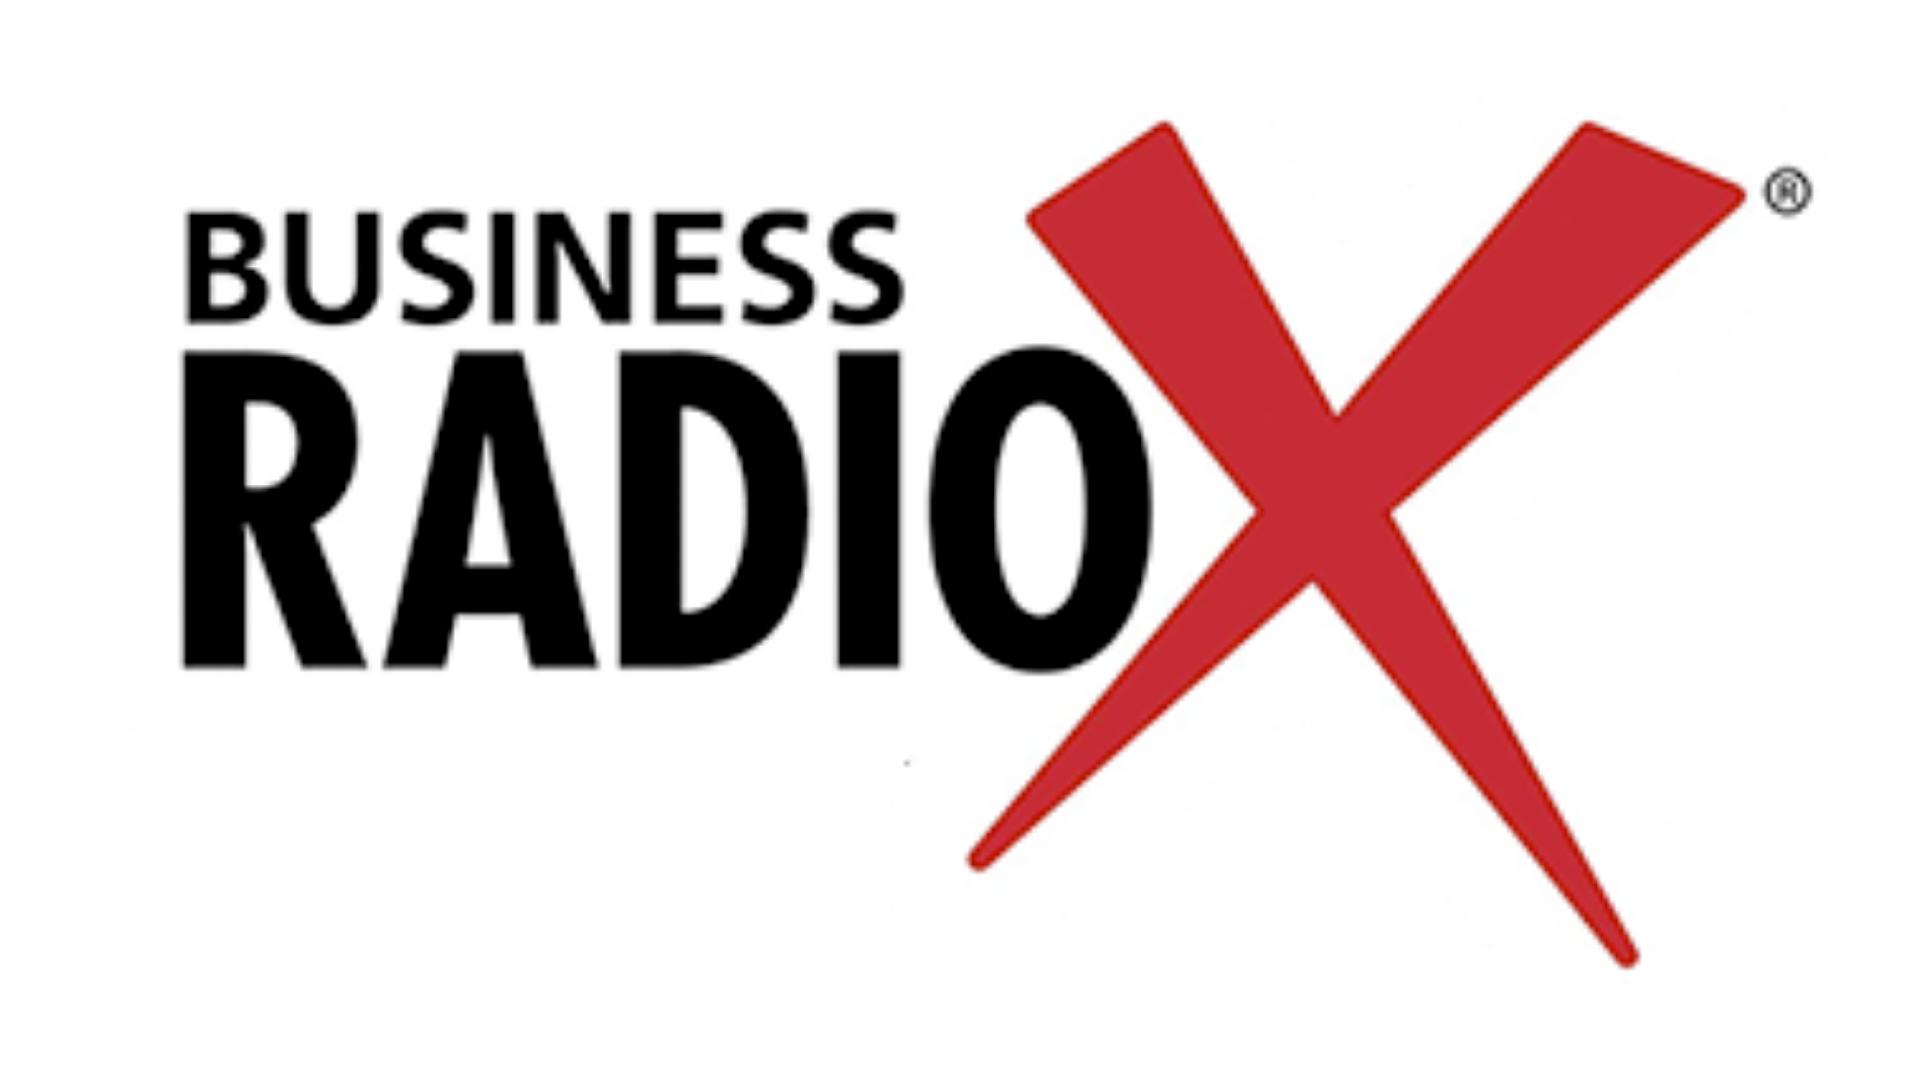 business radio x podcast radio show